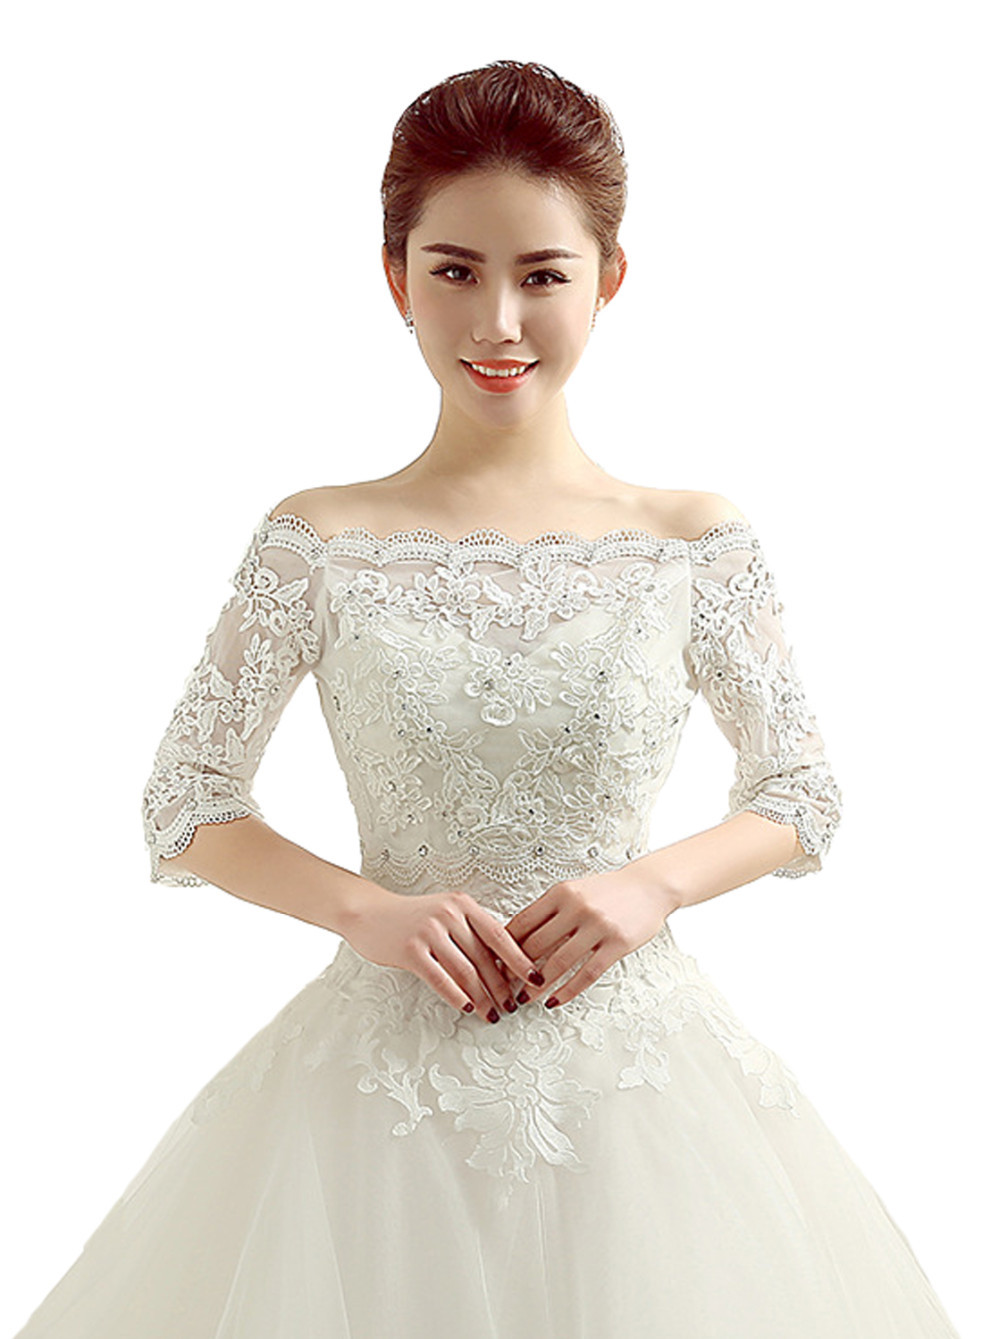 Crocheted Beige Cream Short Wedding Dress Jacket Off The Shoulder